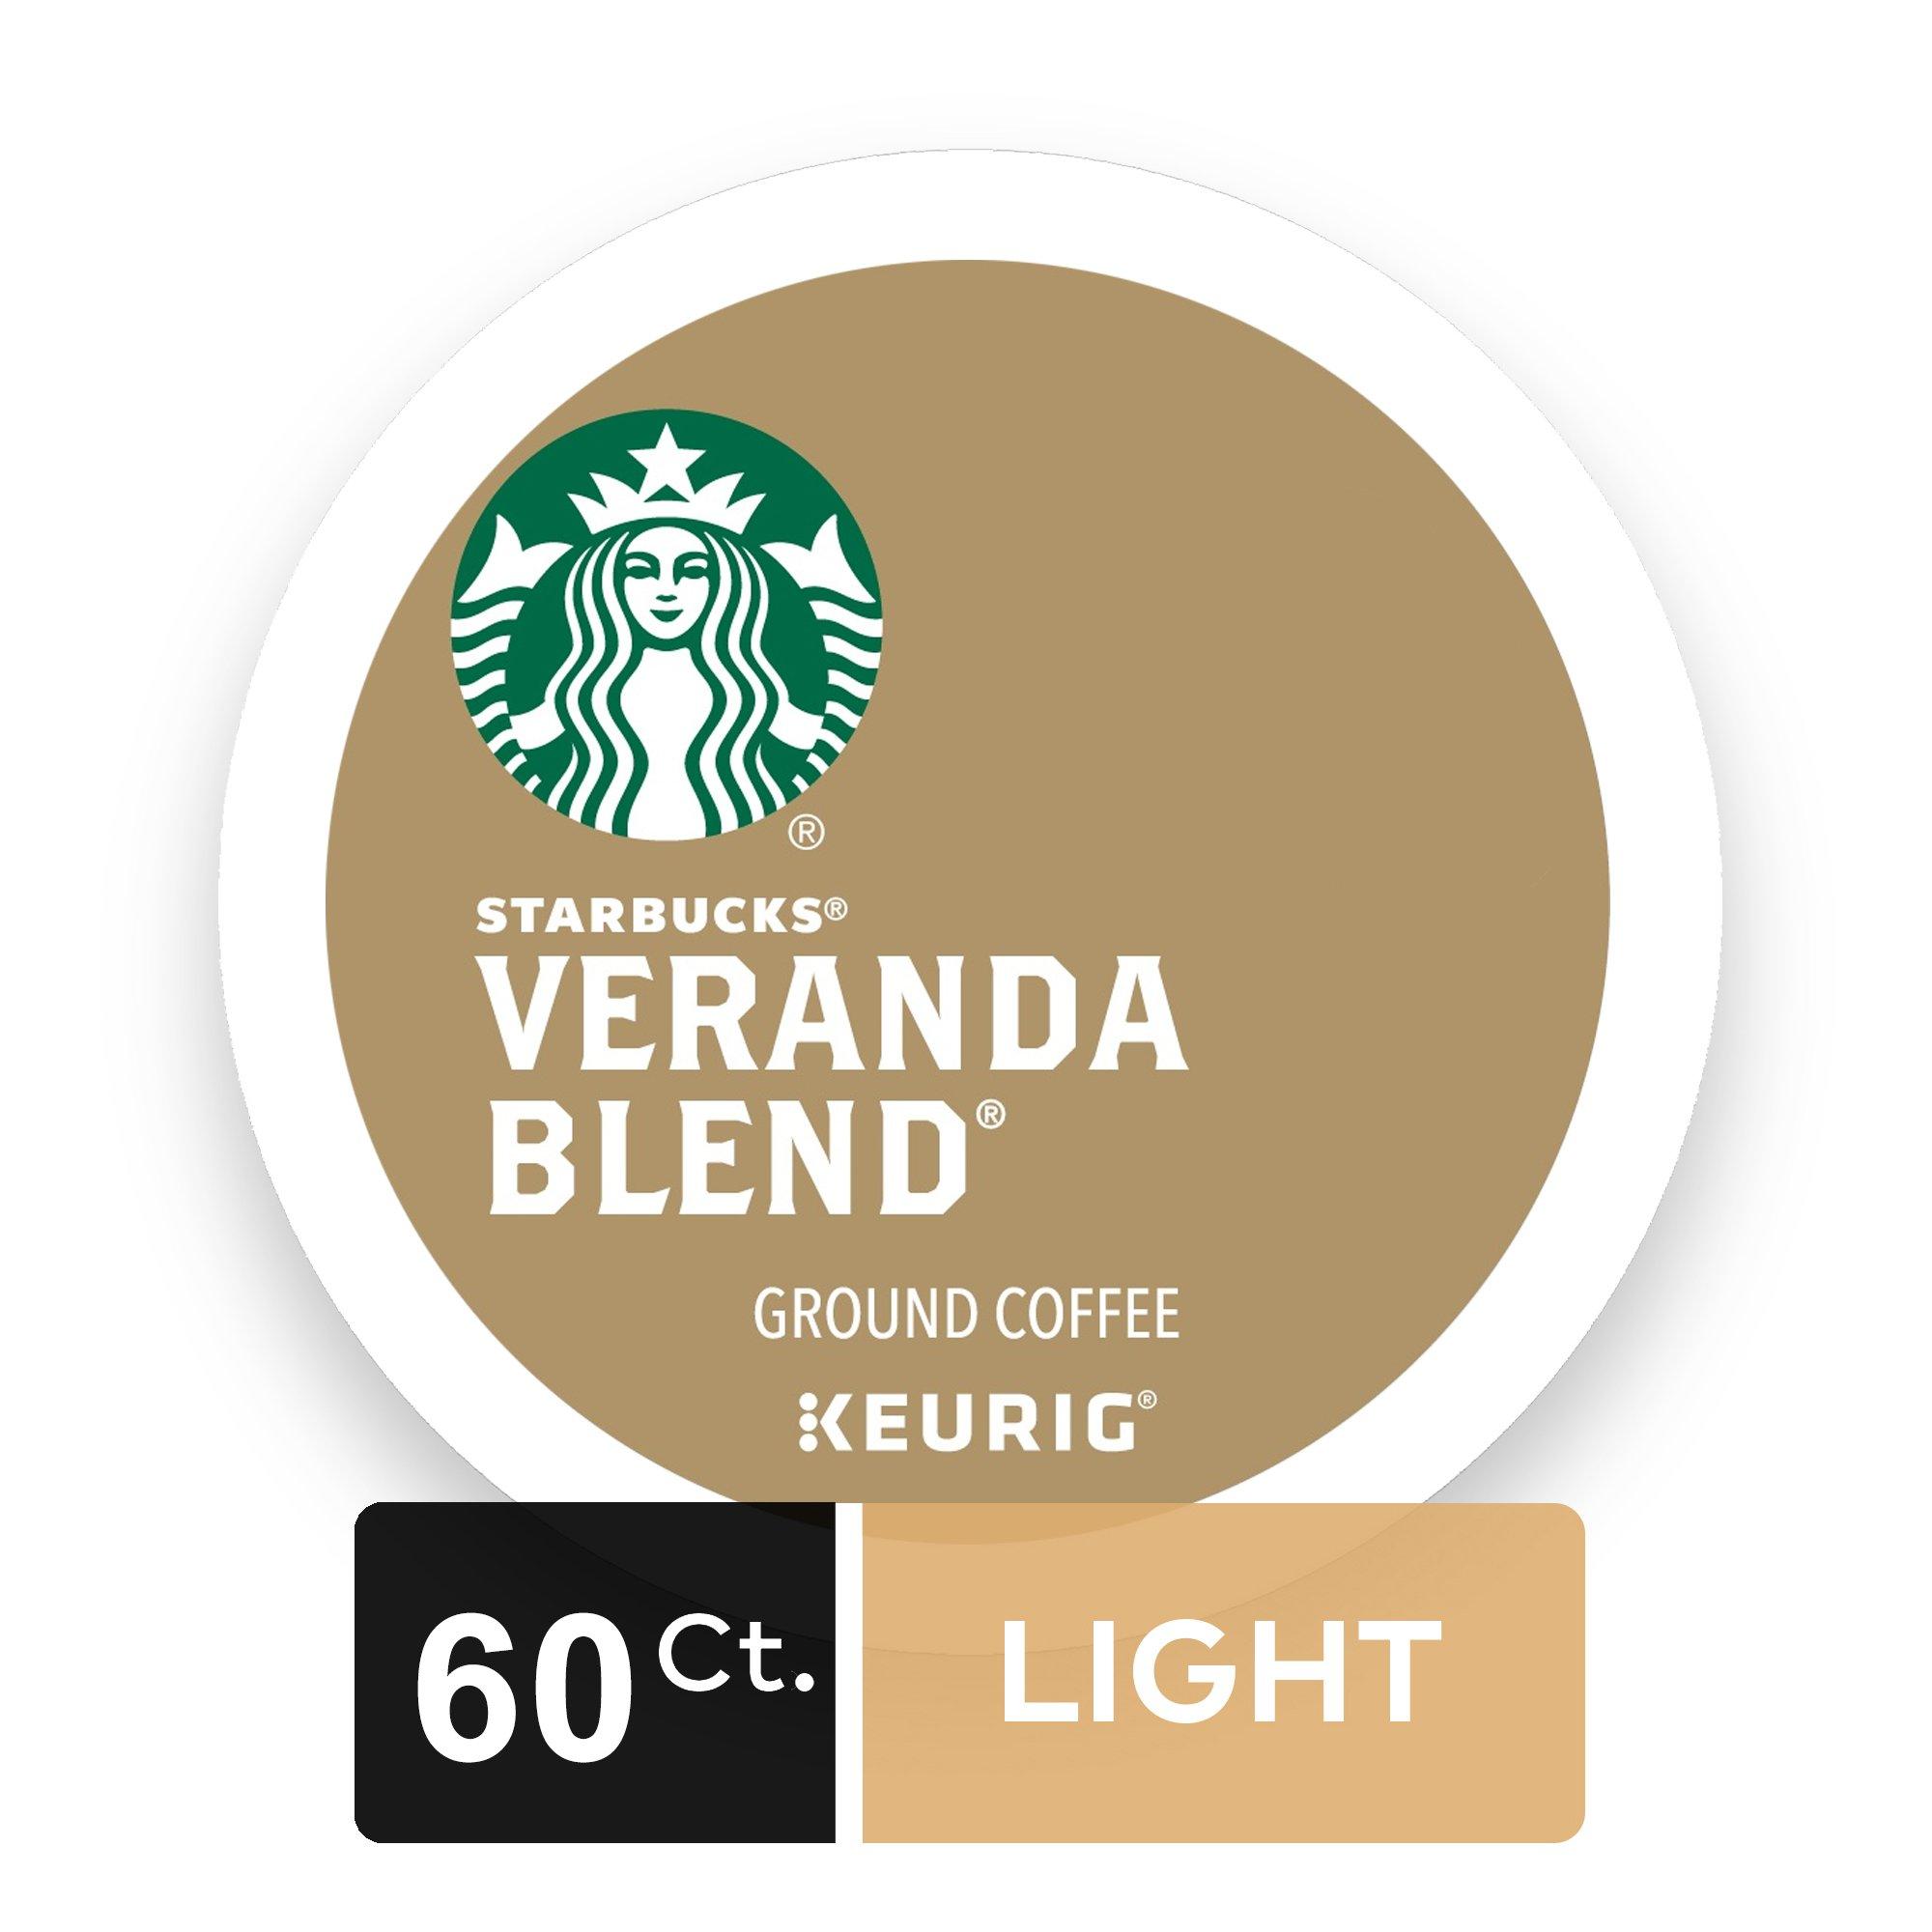 Starbucks Veranda Blend Blonde Light Roast Single Cup Coffee for Keurig Brewers, 6 Boxes of 10 (60 Total K-Cup pods)